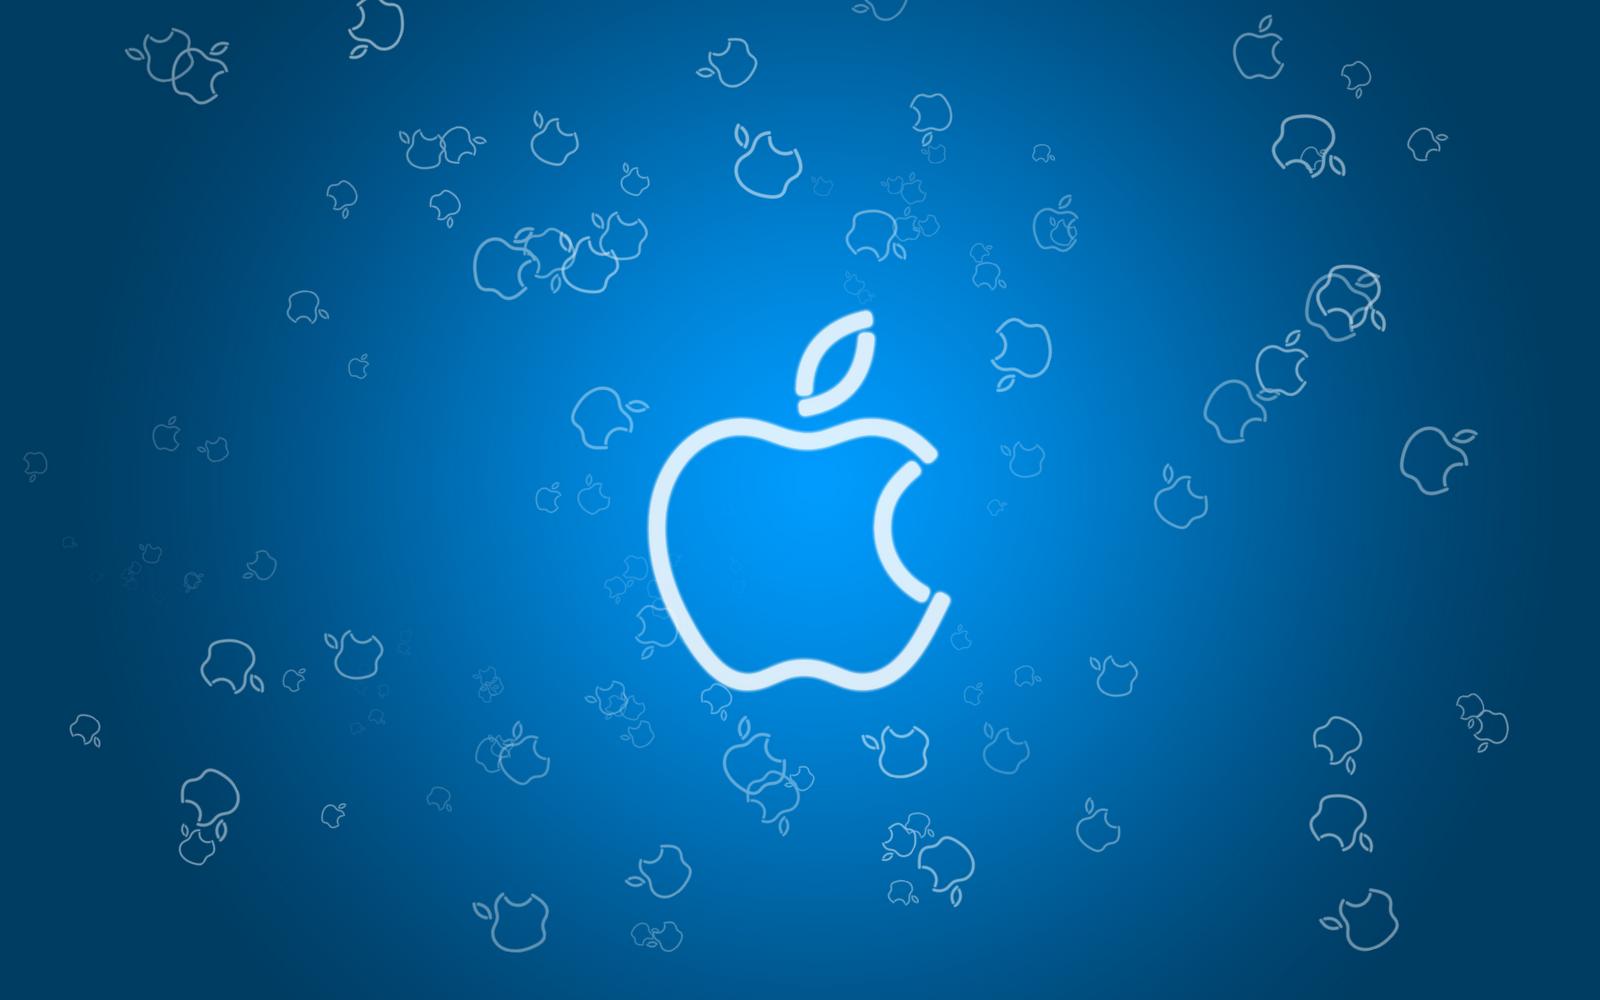 http://4.bp.blogspot.com/-Xo-sZ1NRyoA/Tdgq-HWx-lI/AAAAAAAAALY/wXsoh9WOSt0/s1600/Apple_flakes_blue_hd_wallpaper.png